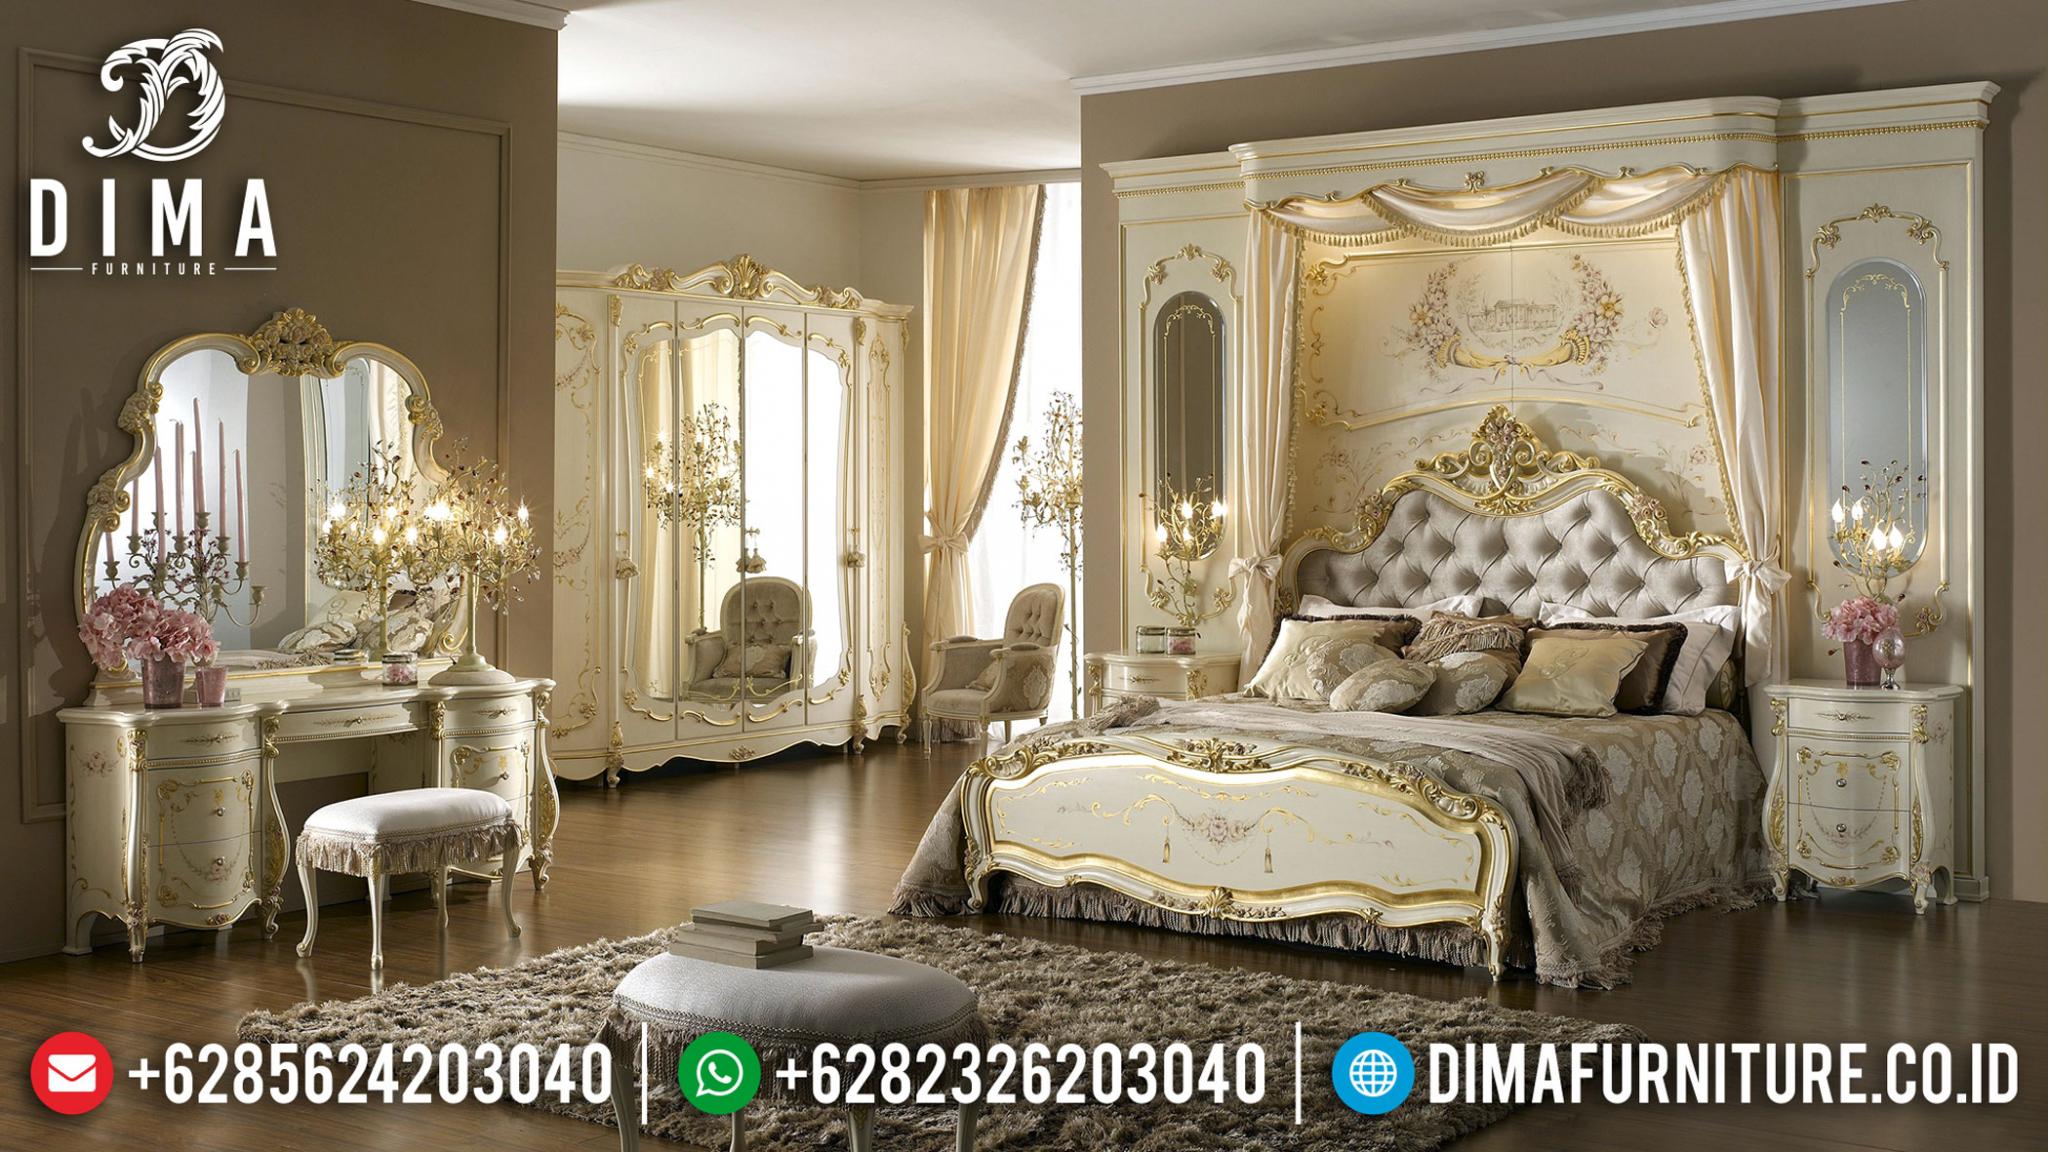 Exquisite Tempat Tidur Mewah Jepara Monnalisa Golden Ivory DF-1353